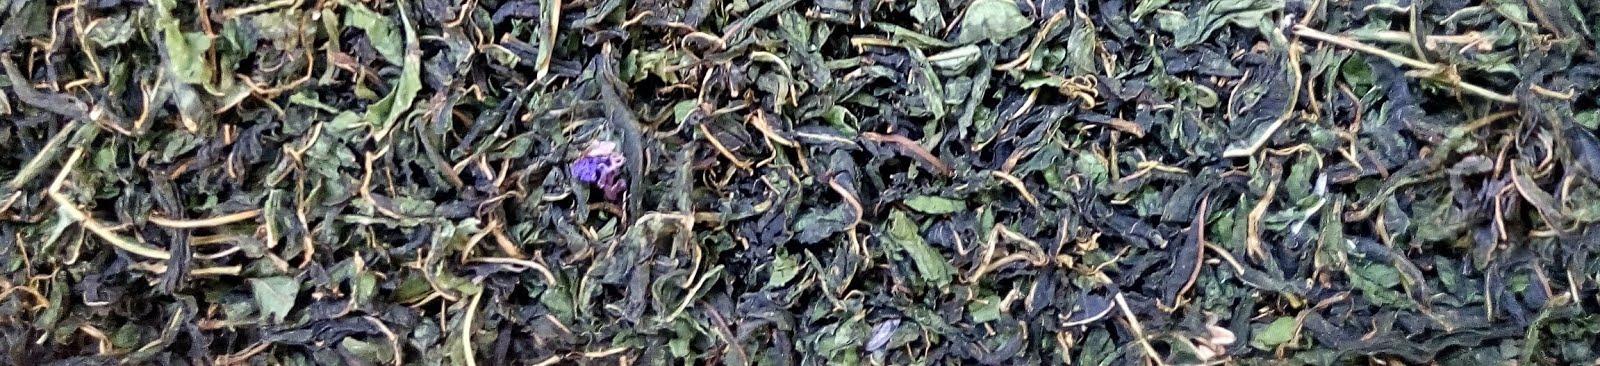 Мини линии для производства чая | Бизнес на эко травах